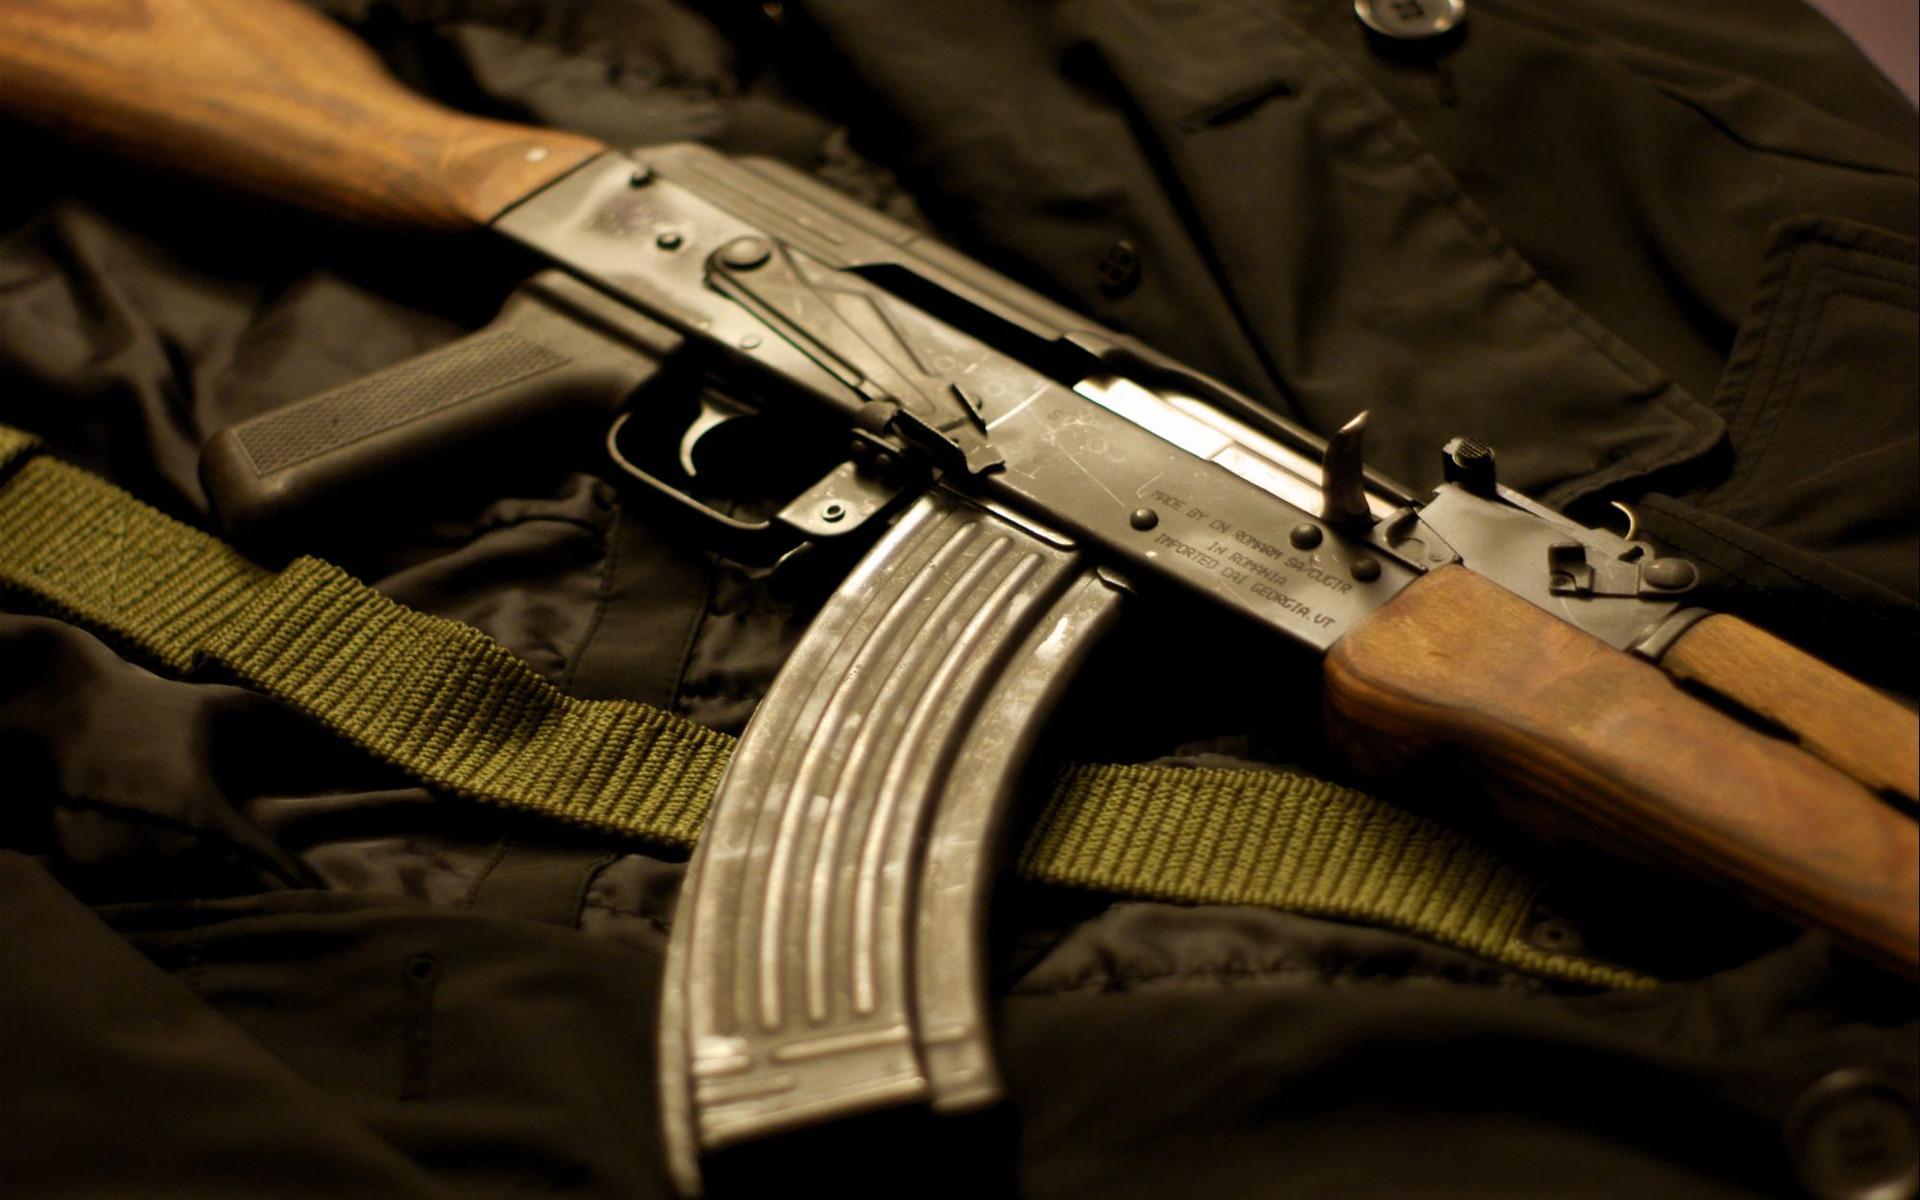 Rifle Assault Rifle AK-47 Macro weapons guns wallpaper